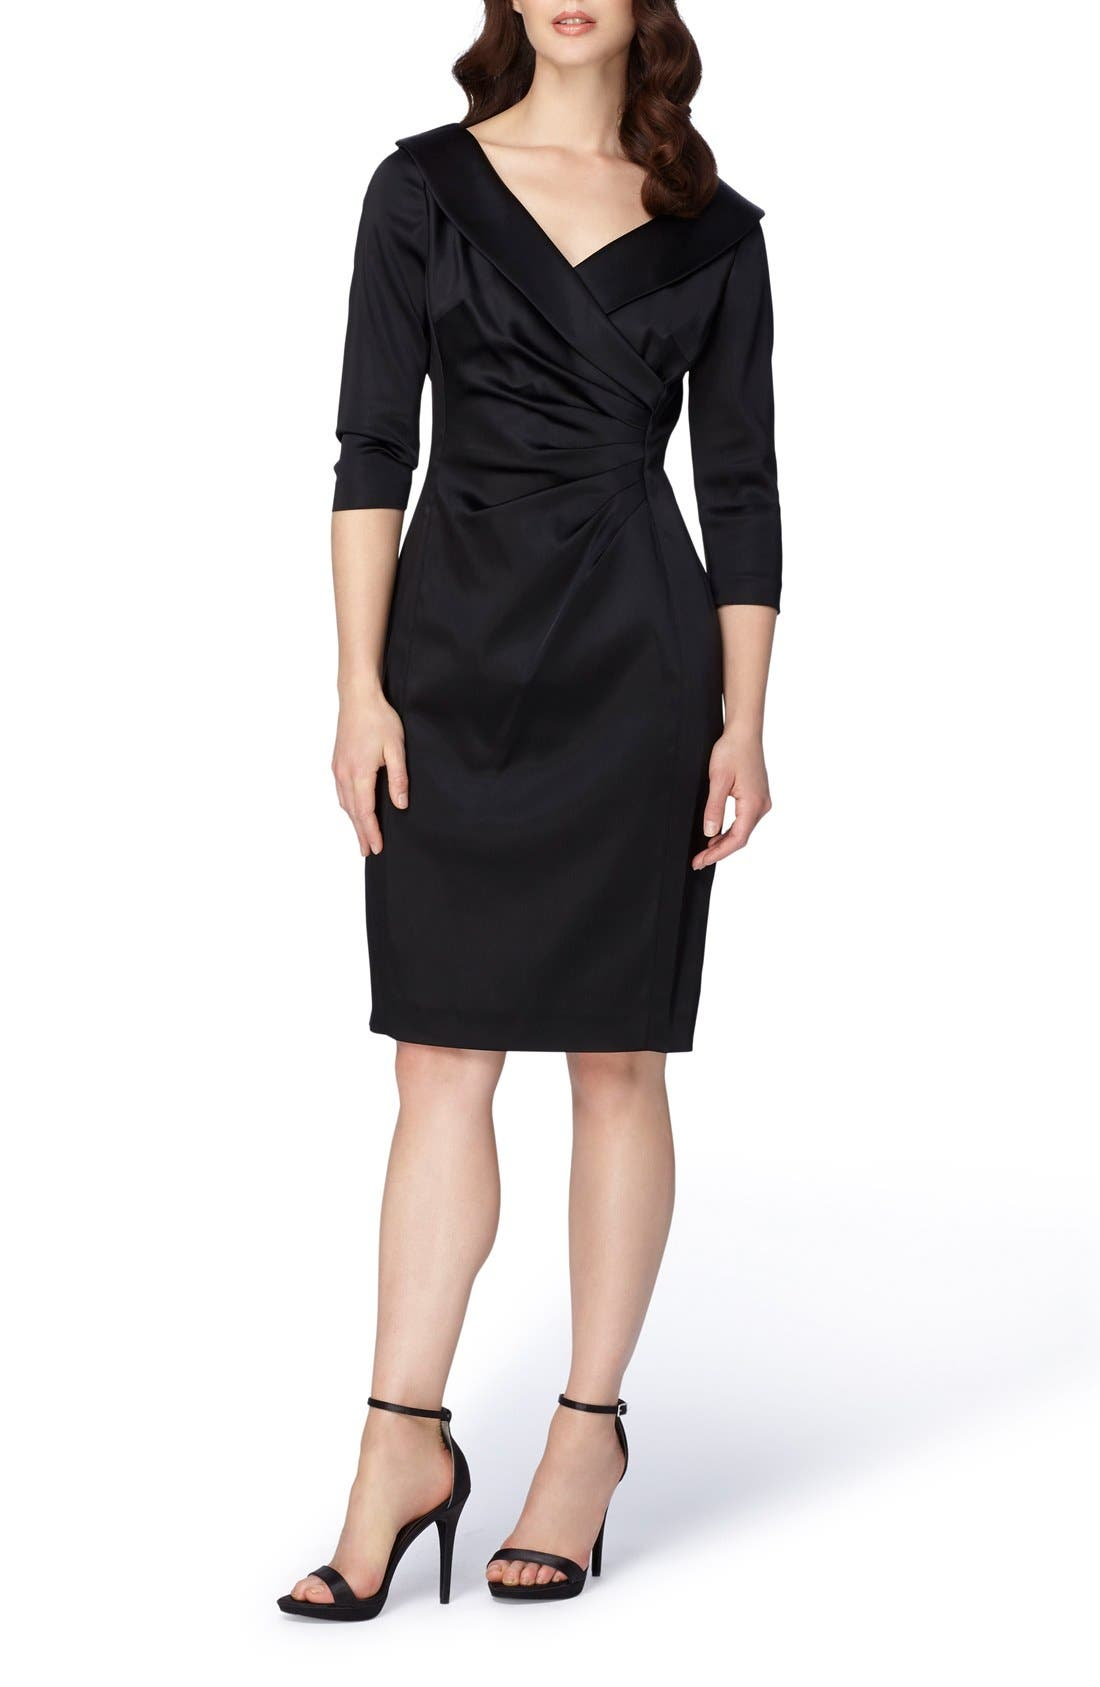 Alternate Image 1 Selected - Tahari Portrait Collar Satin Sheath Dress